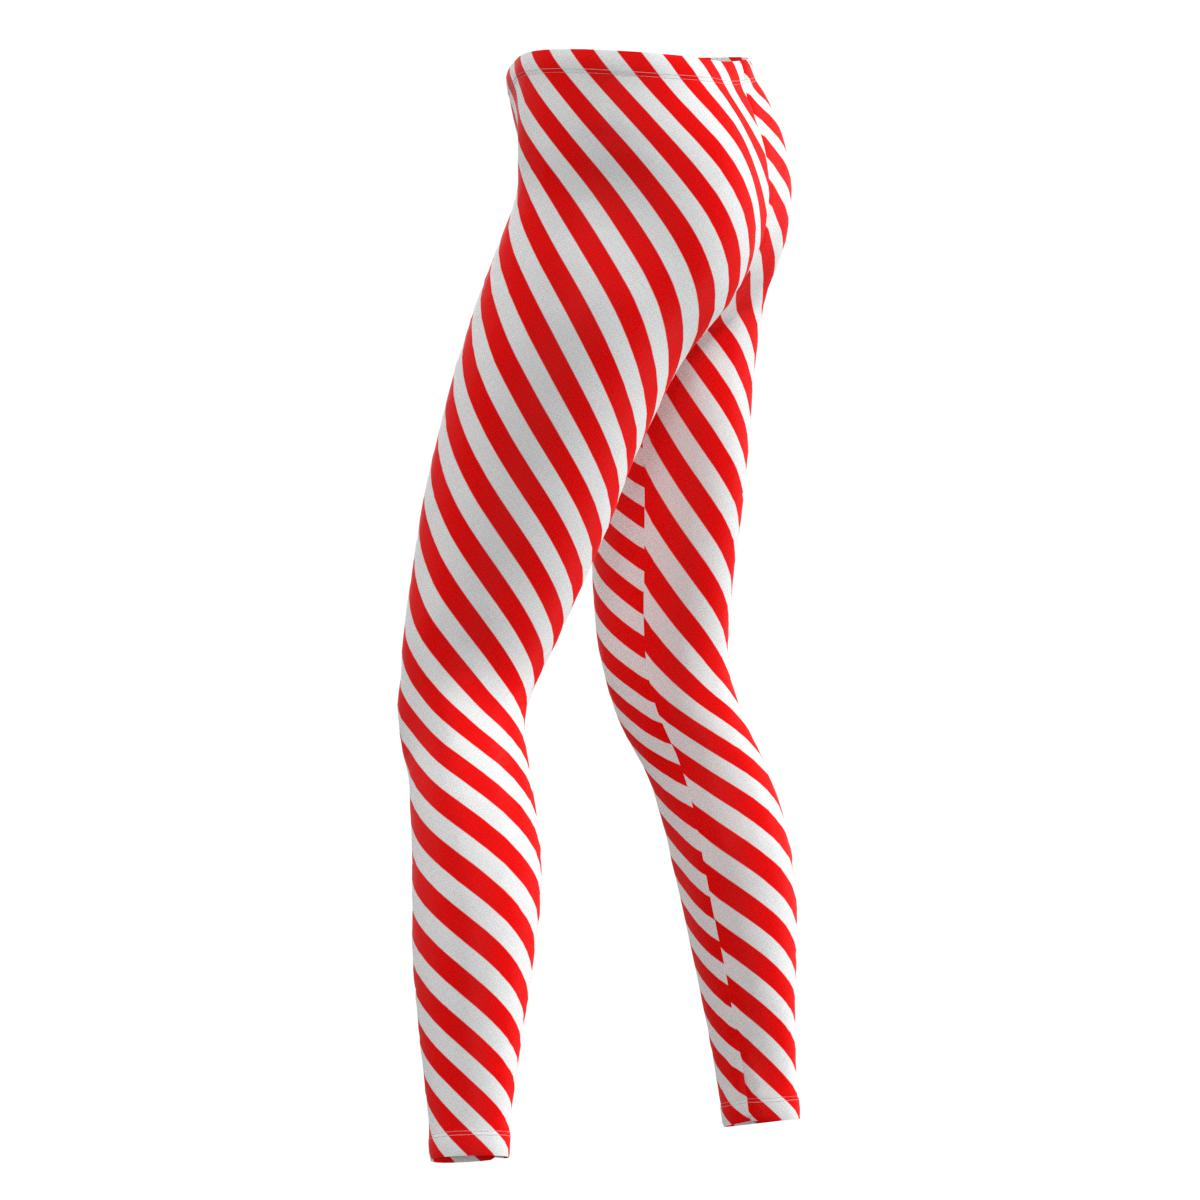 386db9ab12 Details about Red & White Diagonal Stripes Womens Full & Capri Leggings  Size XS-5XL Plus